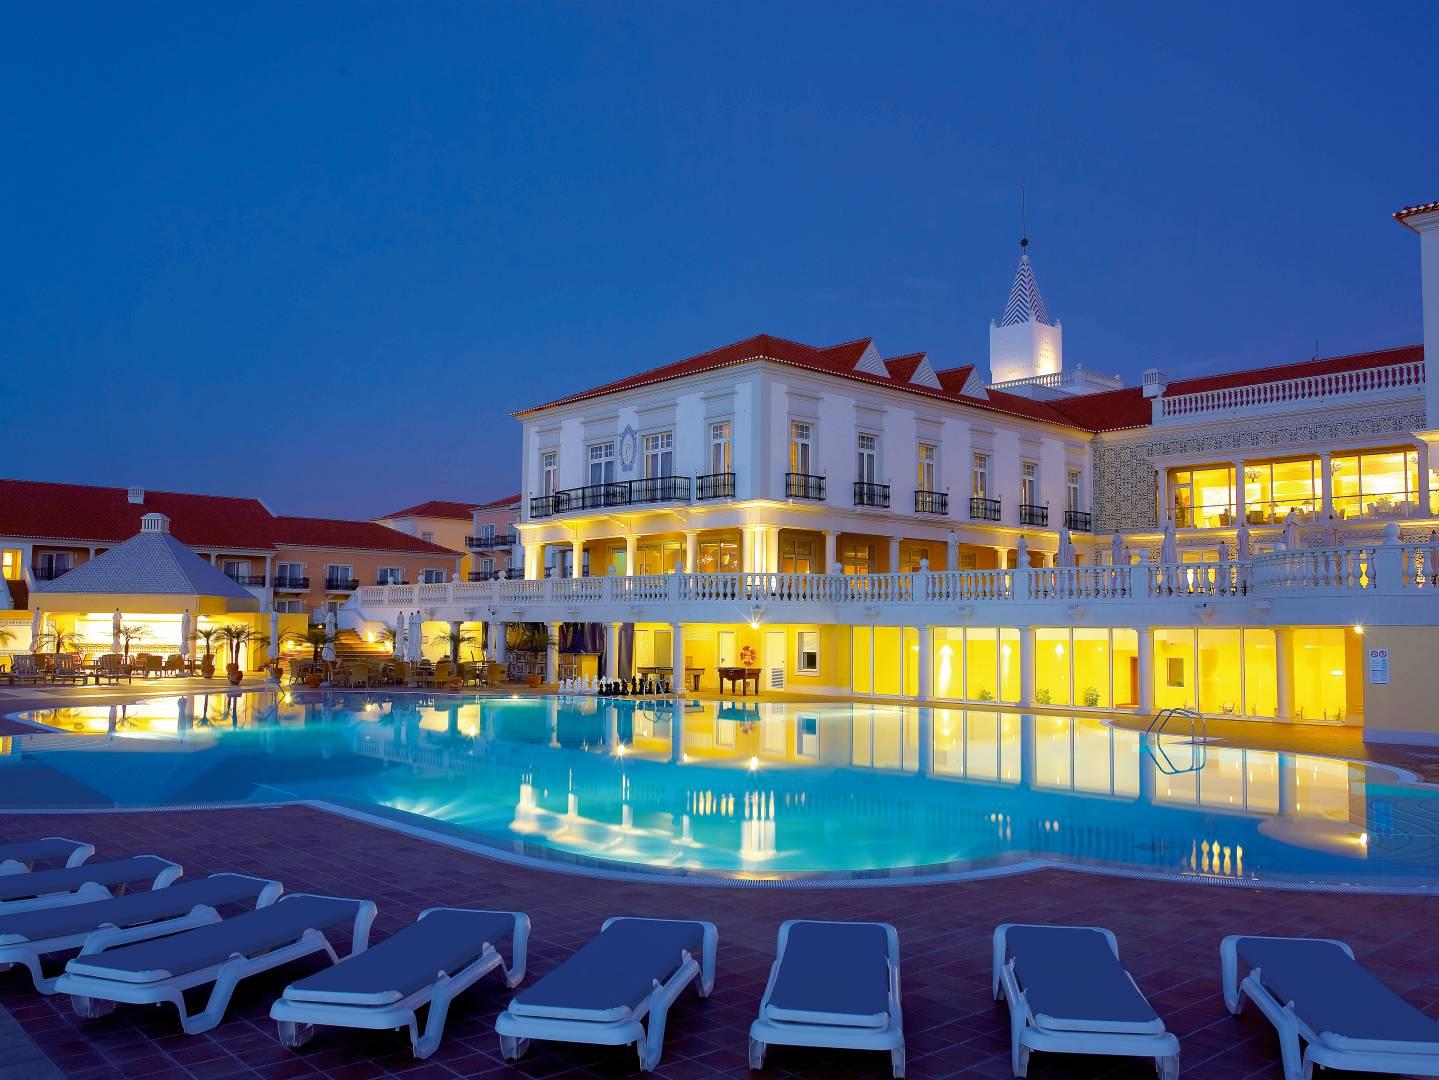 Praia d el rey marriott golf beach resort